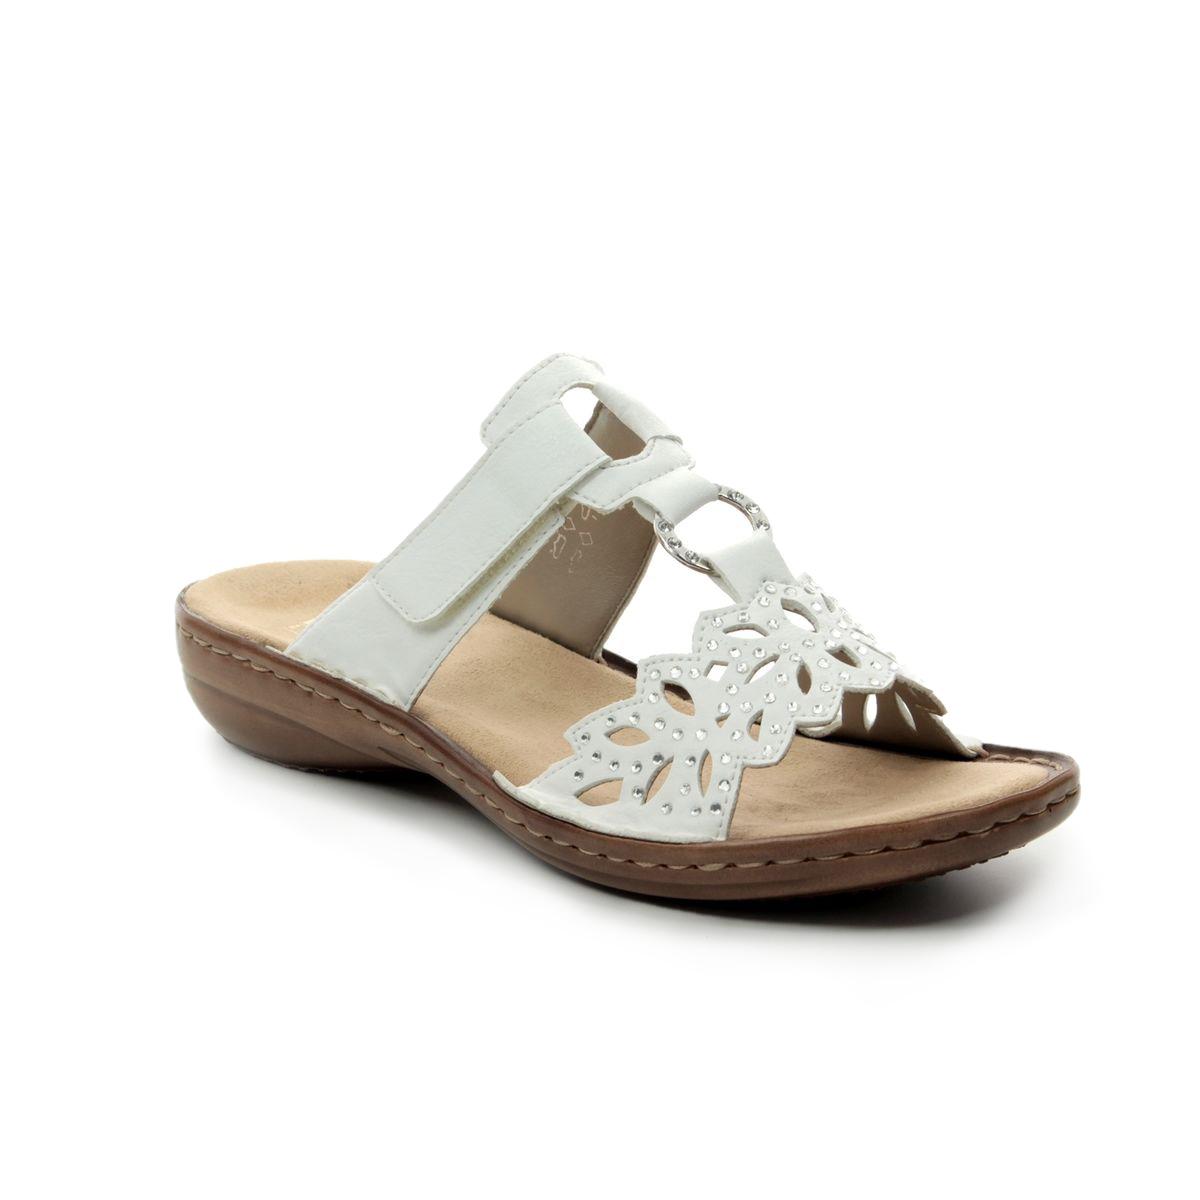 Rieker 608A6-80 White Slide Sandals